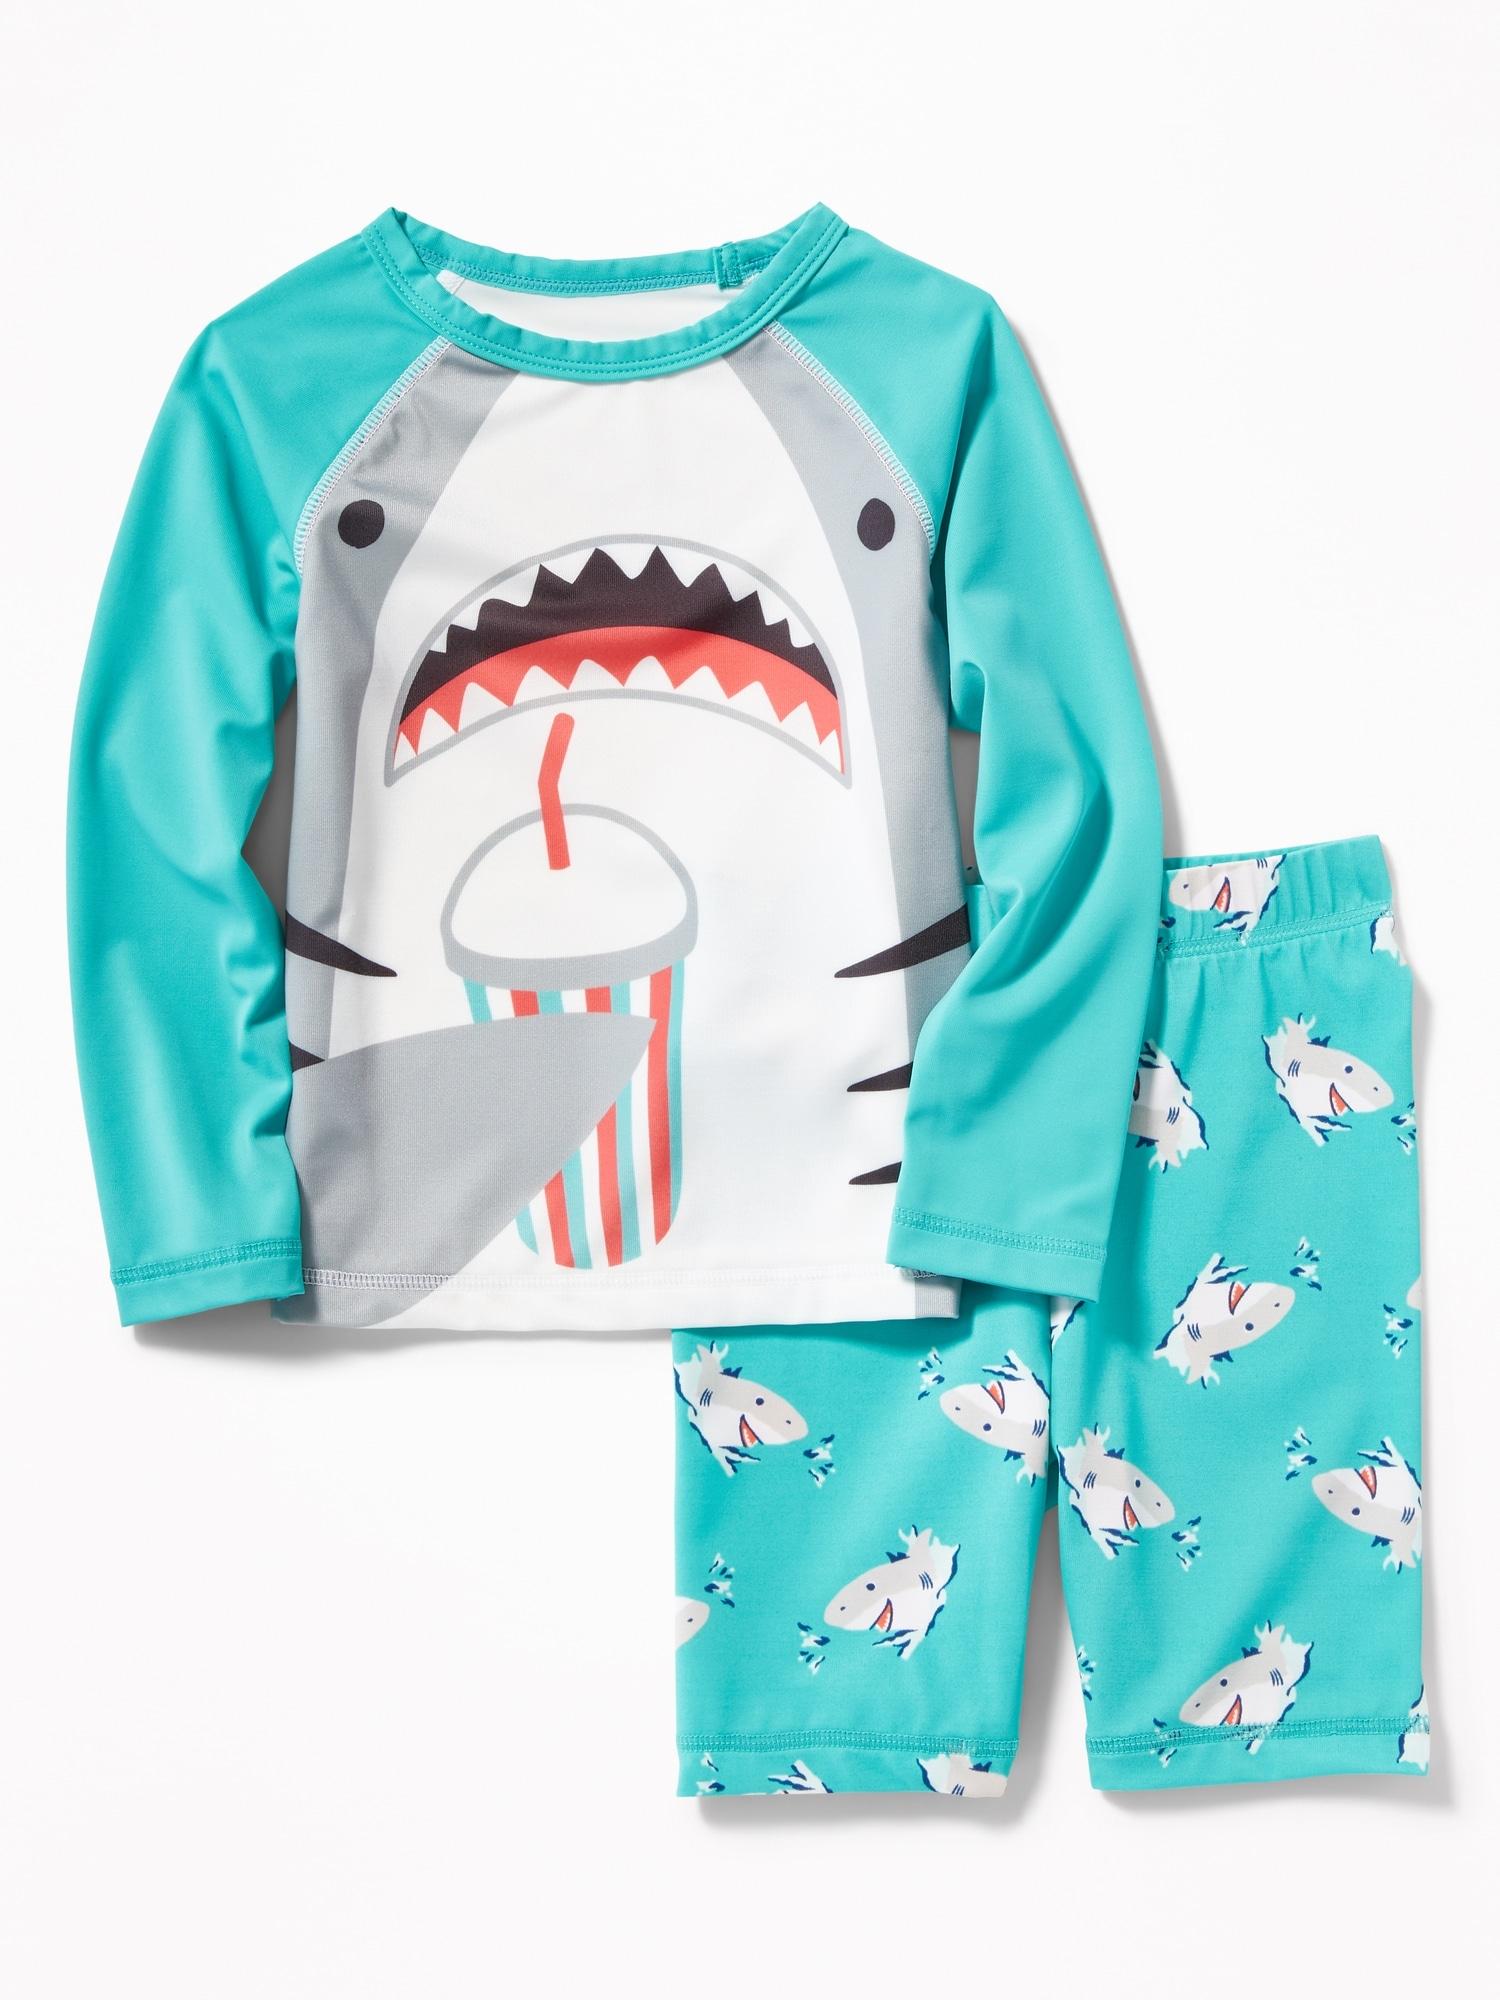 ccb34b98 Shark-Graphic Rashguard Swim Set for Toddler Boys | Old Navy